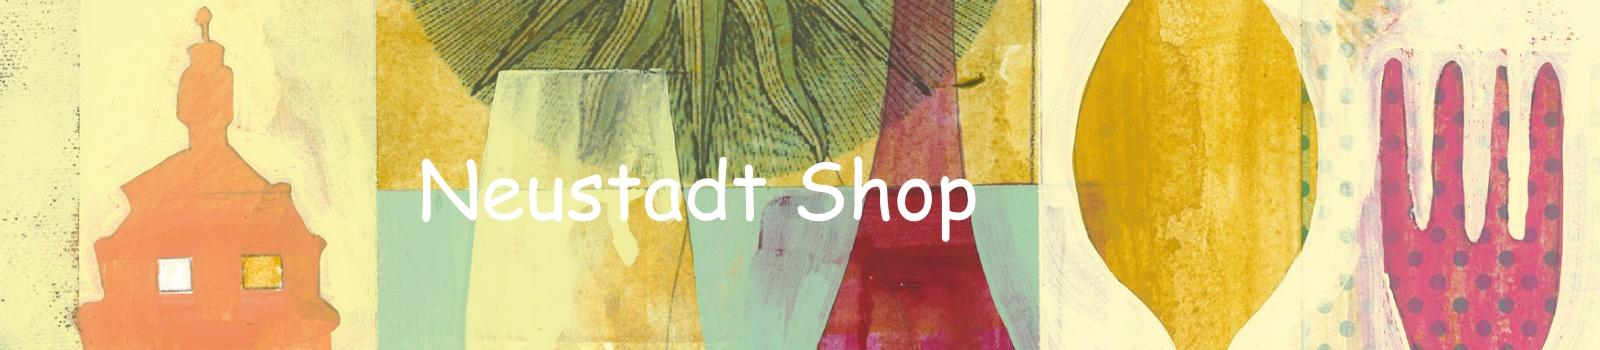 Shop Neustadt